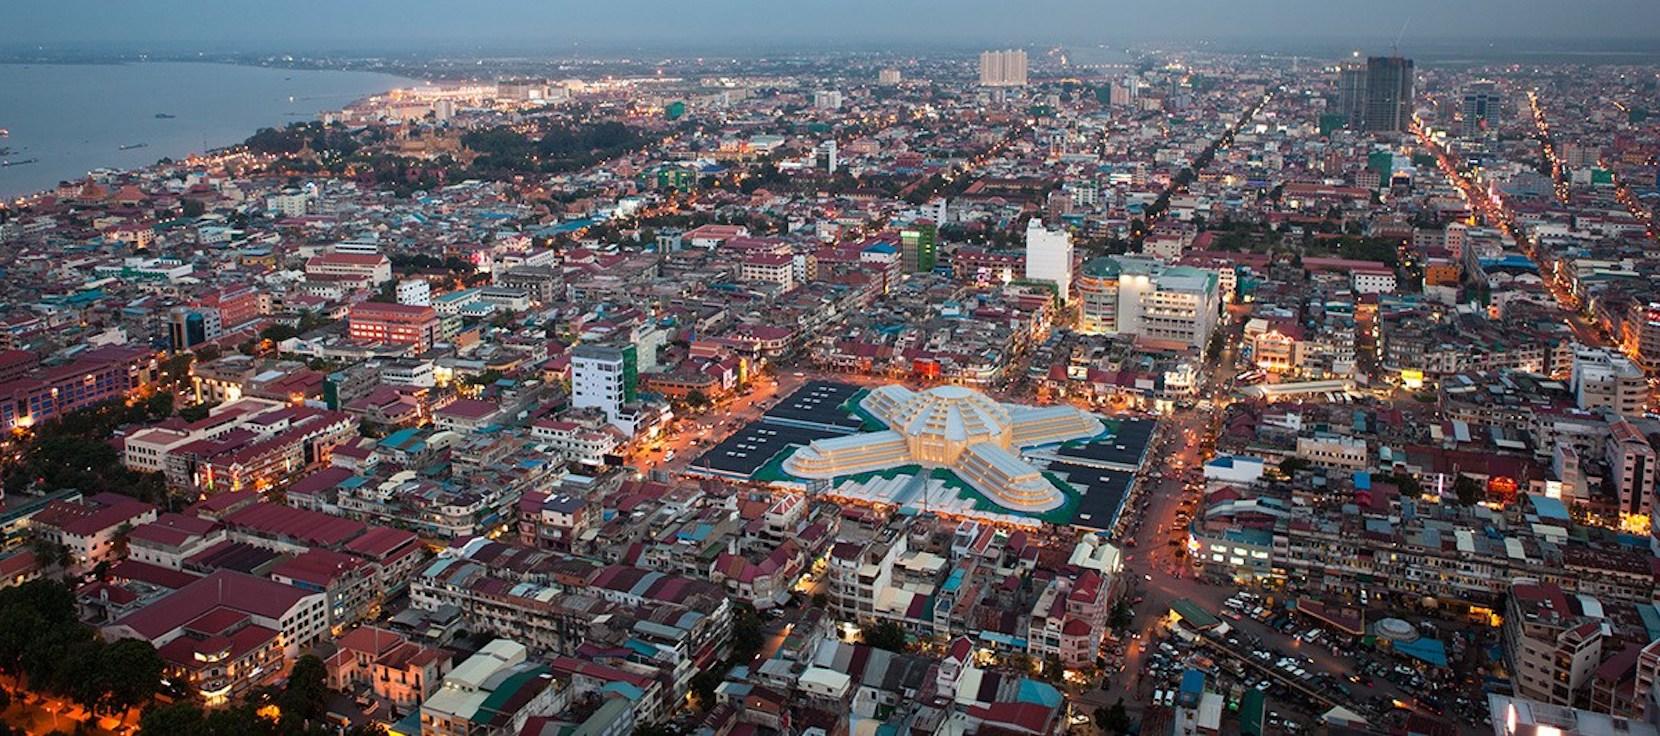 4 Day Phnom Penh Free & Easy (Luxury) 16/09/18 <> 19/12/18